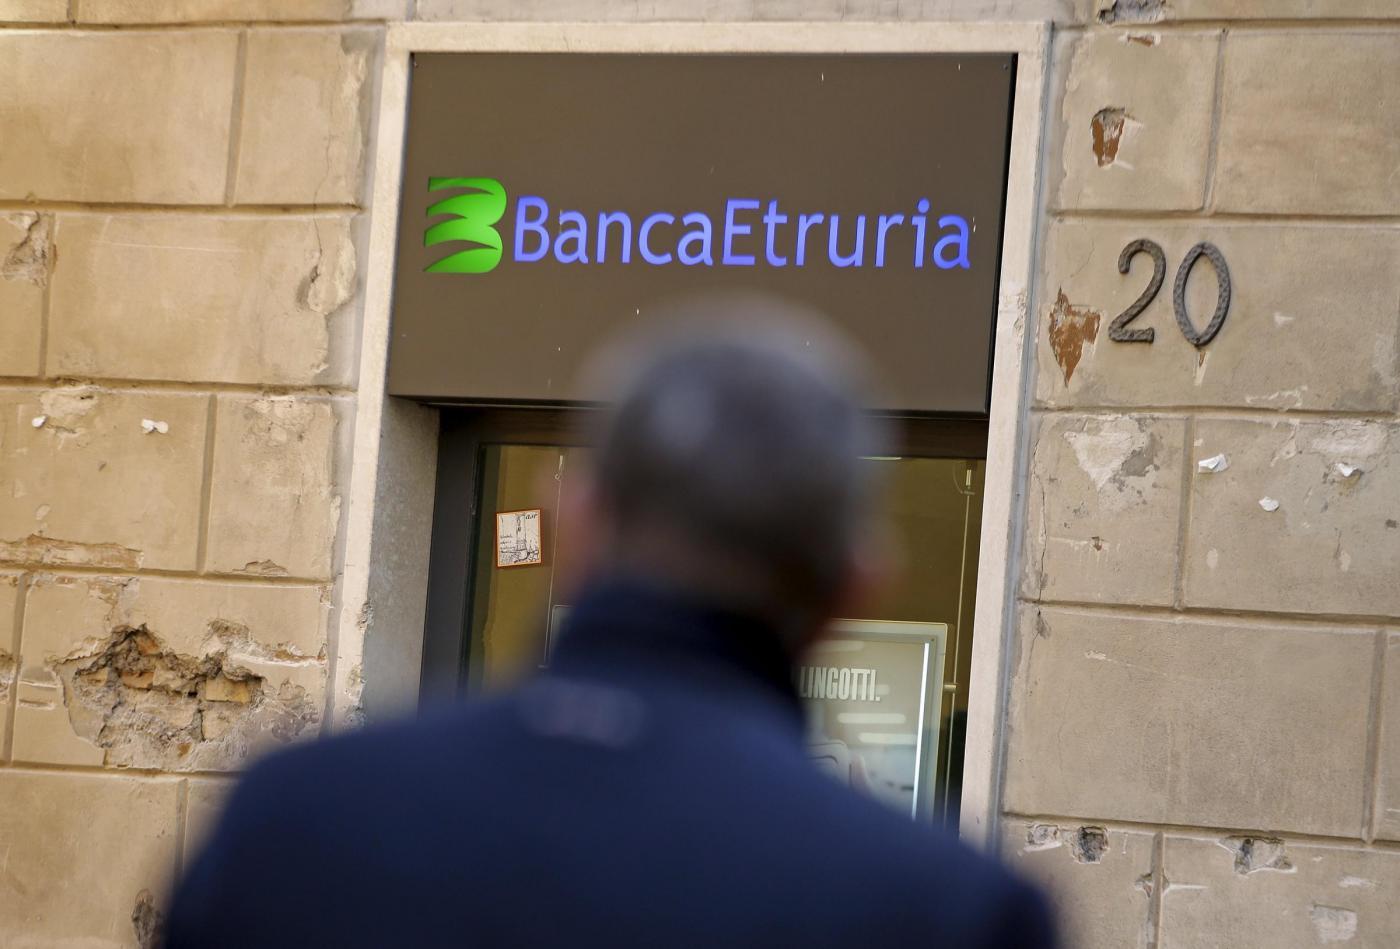 banca etruria 150x150